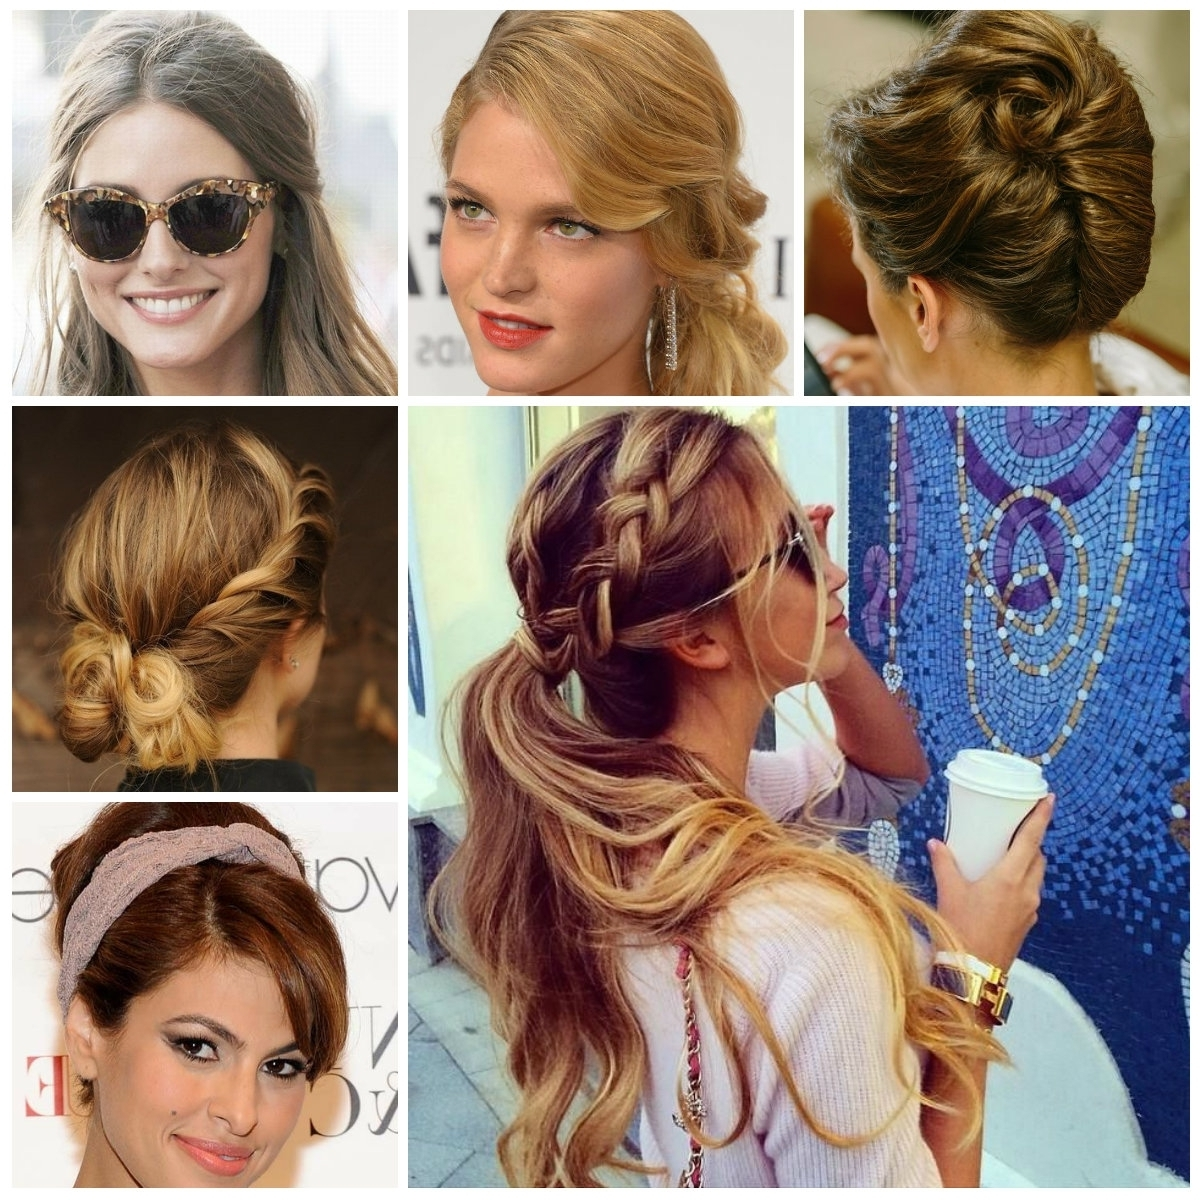 Easy Casual Updo Hairstyles For Long Hair – Women Medium Haircut Regarding Long Hair Easy Updo Hairstyles (Gallery 10 of 15)